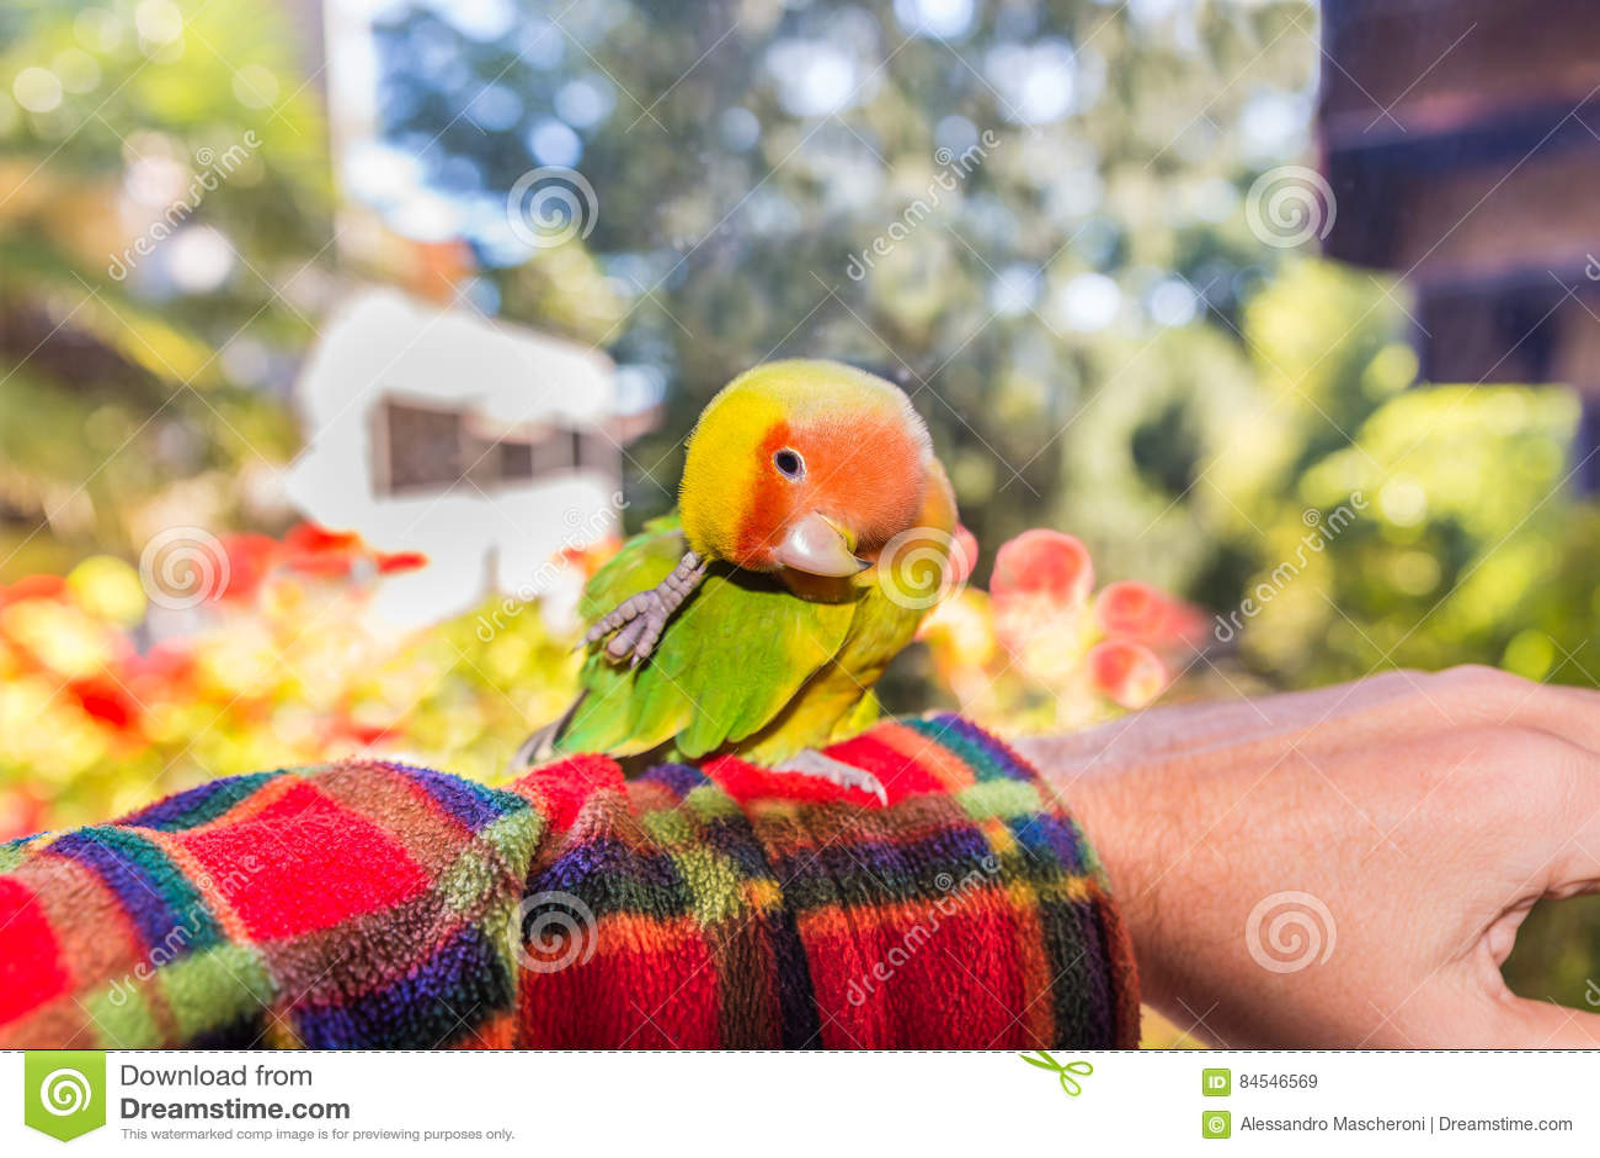 Kolorowa Lovebird papuga - Agapornis roseicollis